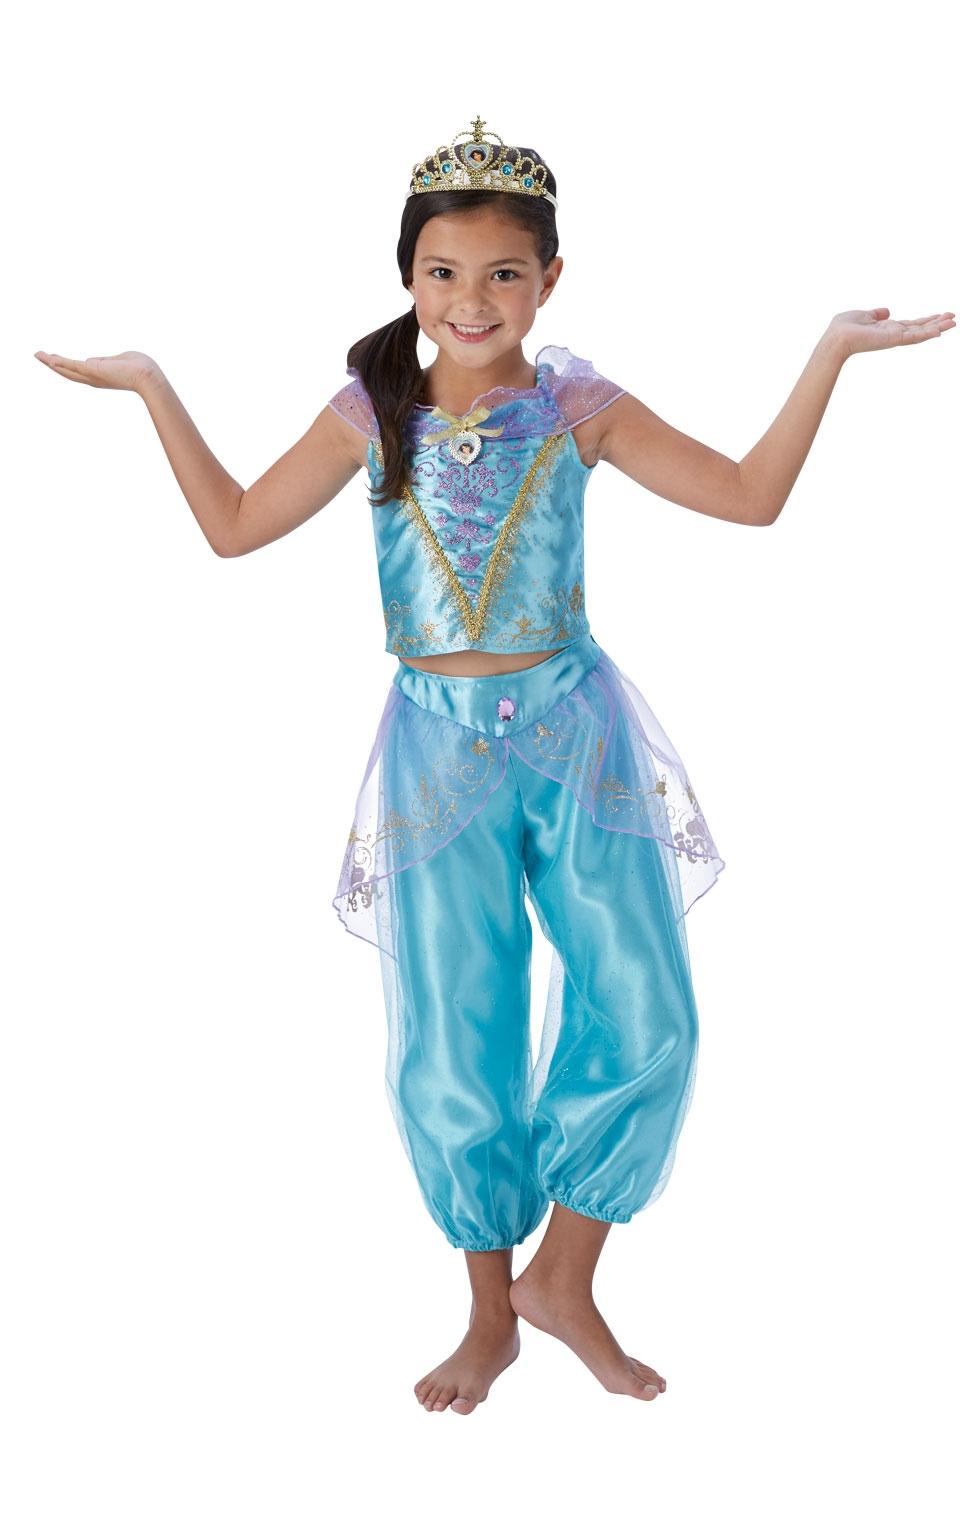 цены на Костюм Жасмин Disney (28-30) в интернет-магазинах